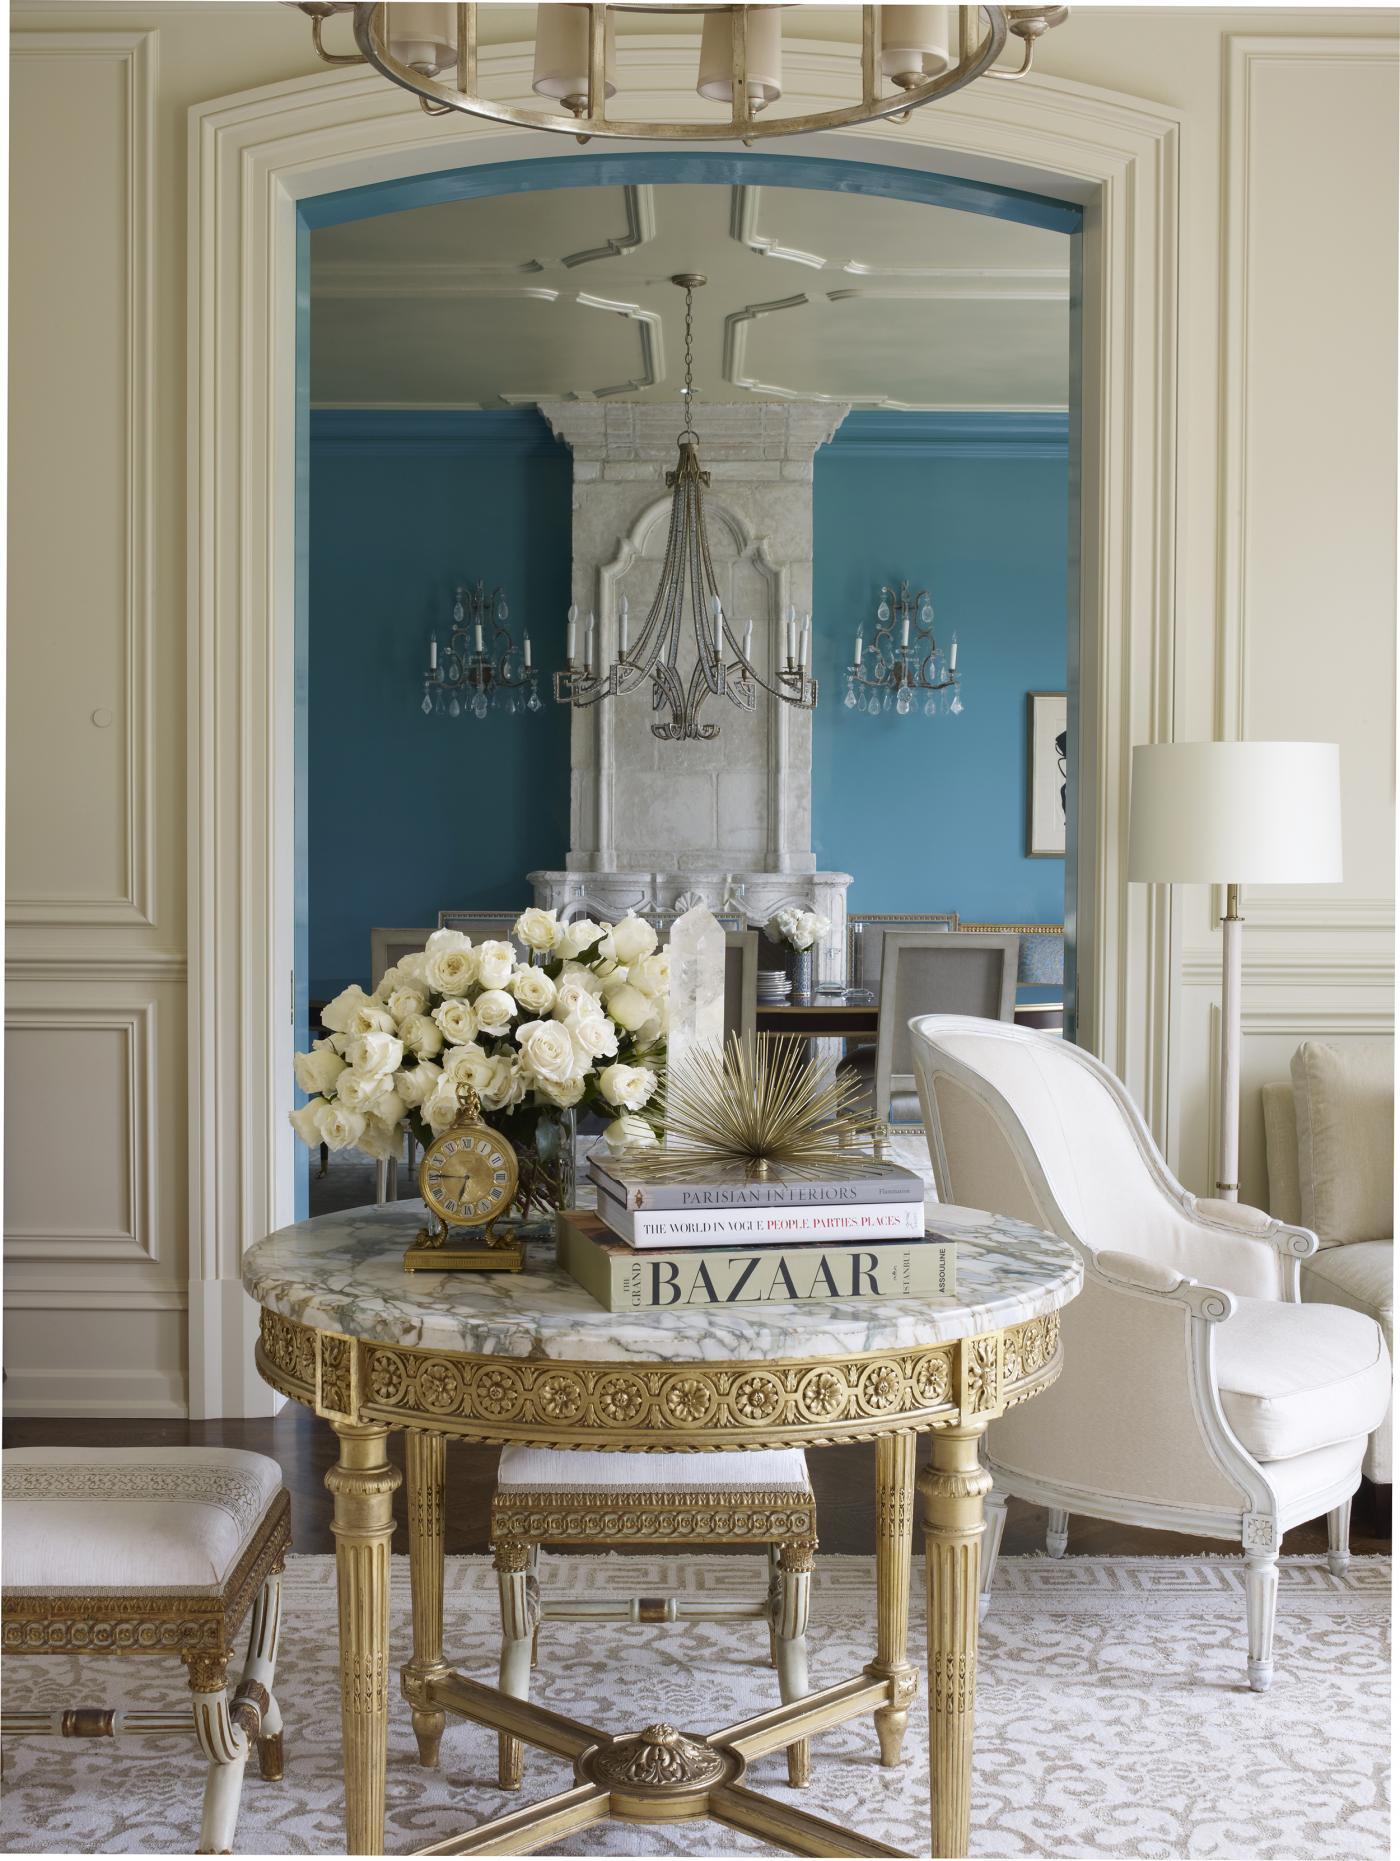 Suzanne Kasler Interiors · Image Title